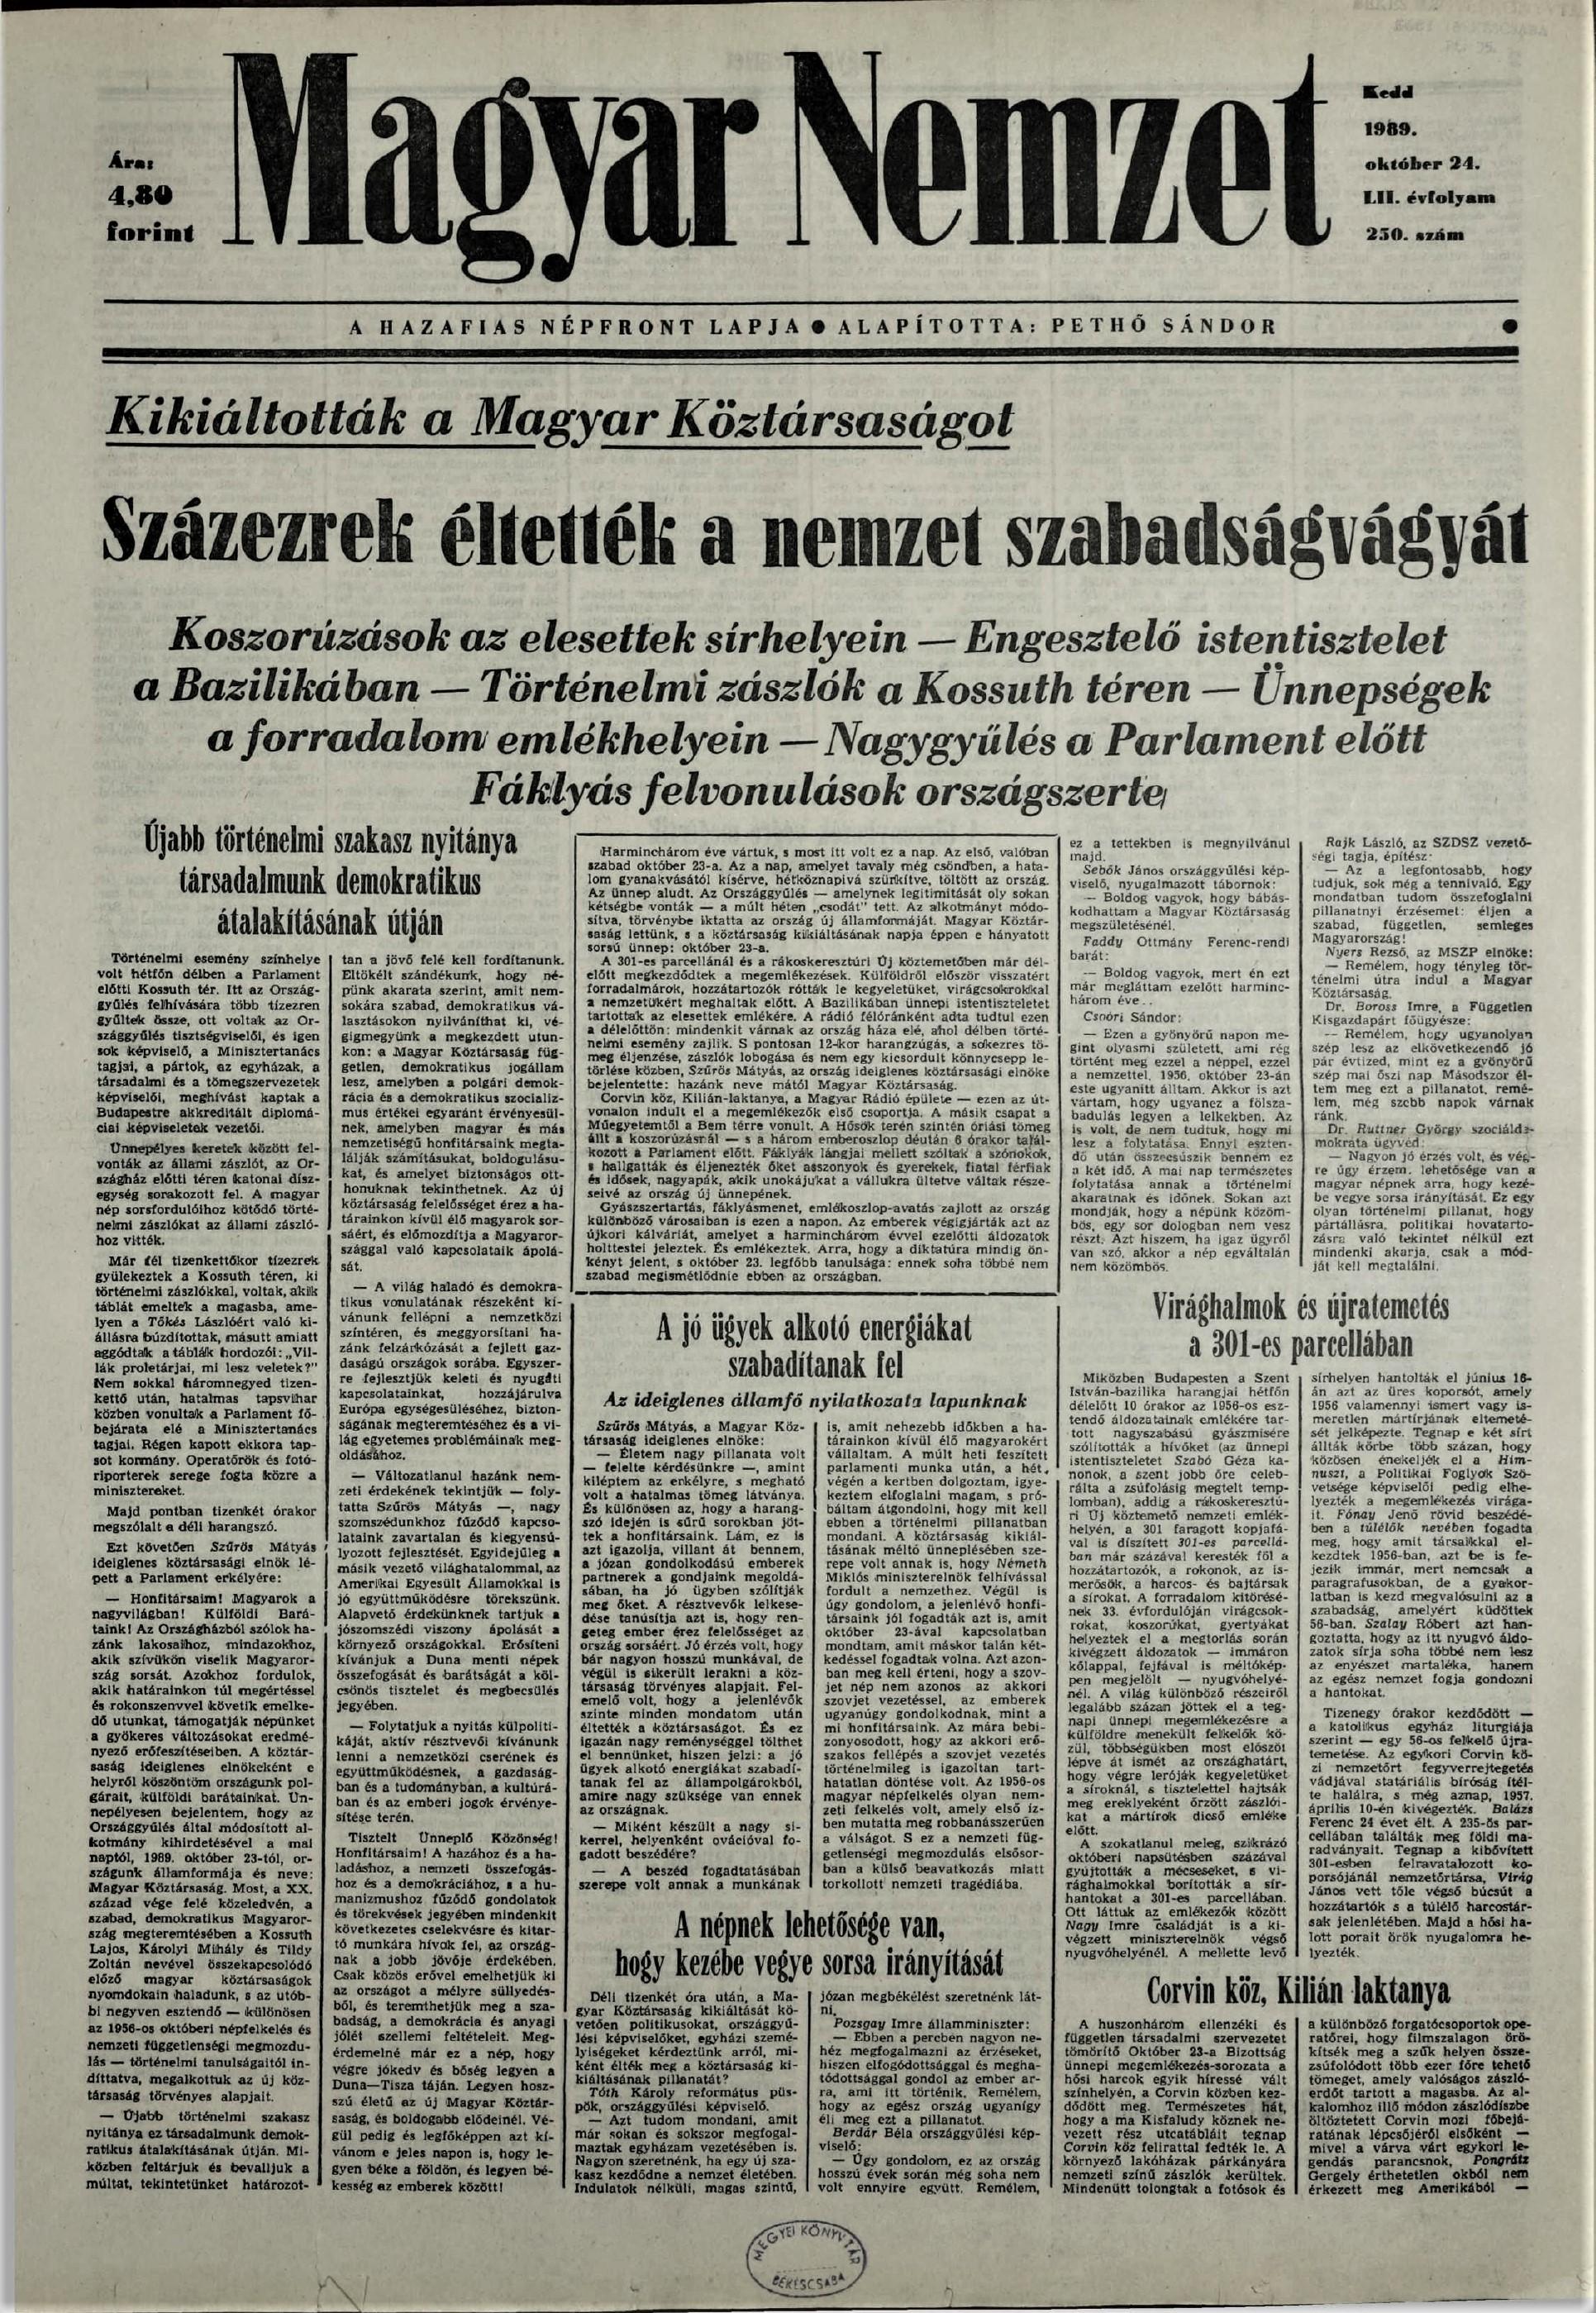 magyarnemzet_1989_10_pages261-262_page-0001.jpg